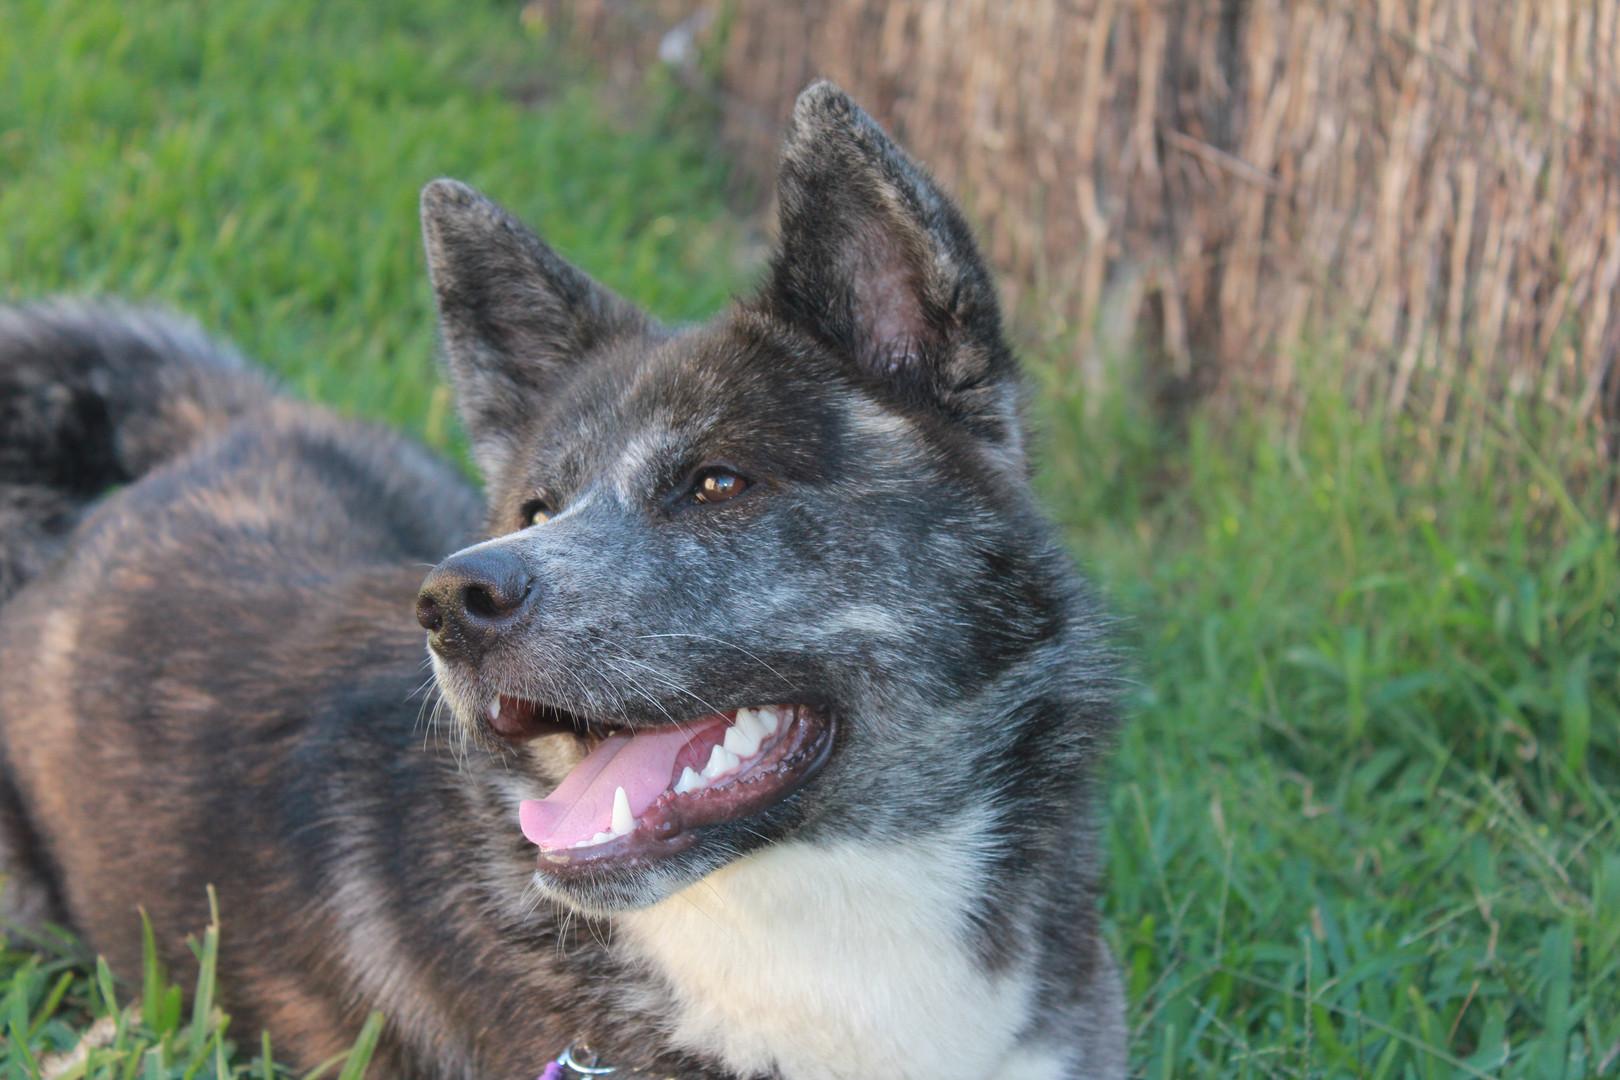 Saki the Akita smiling in the grass